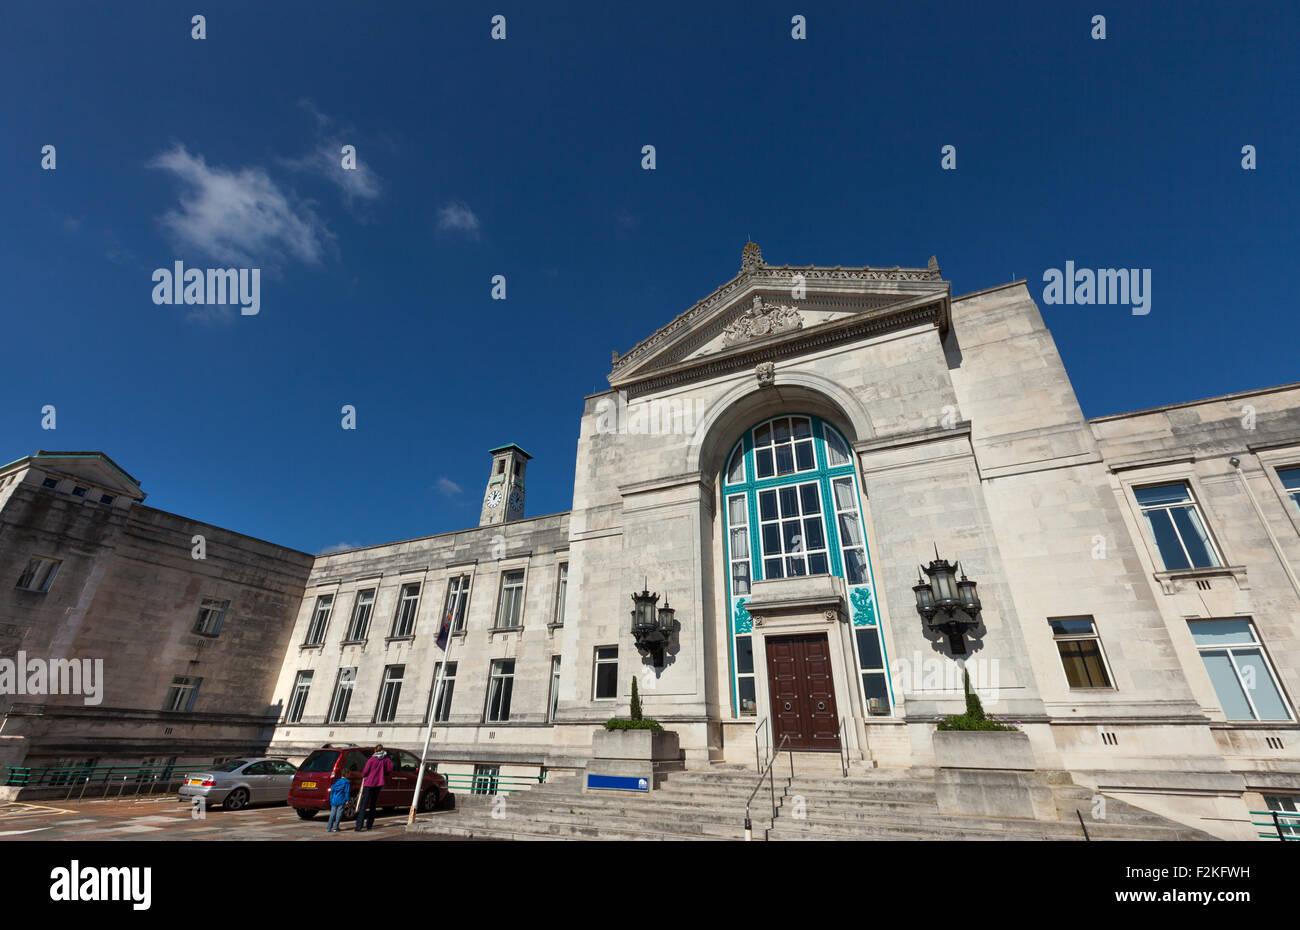 Southampton Civic Centre offices for Southampton City Council, Hampshire, UK - Stock Image